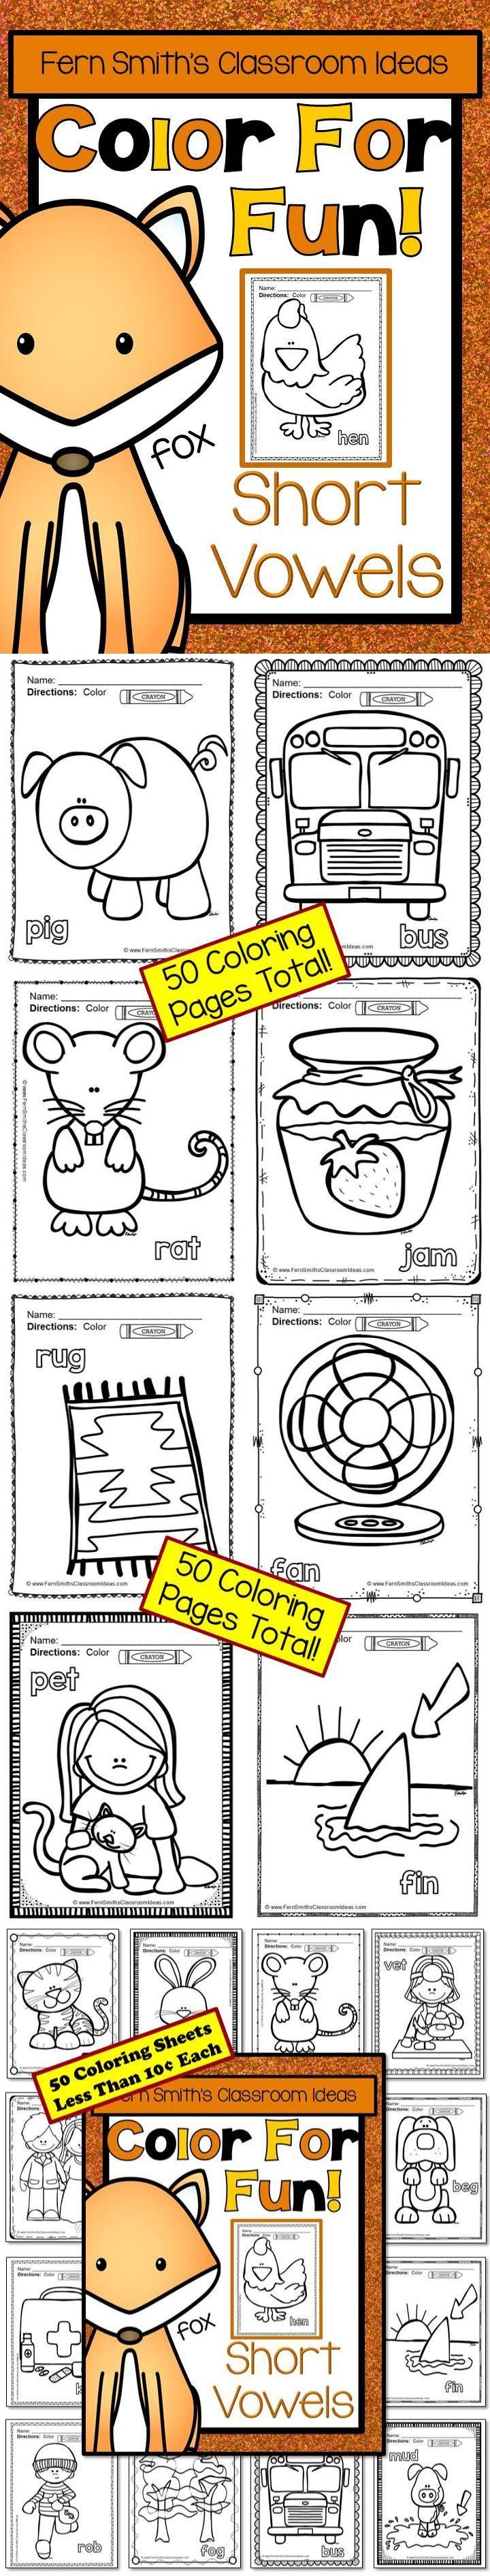 Long vowel coloring sheet - Coloring Pages For Short Vowels